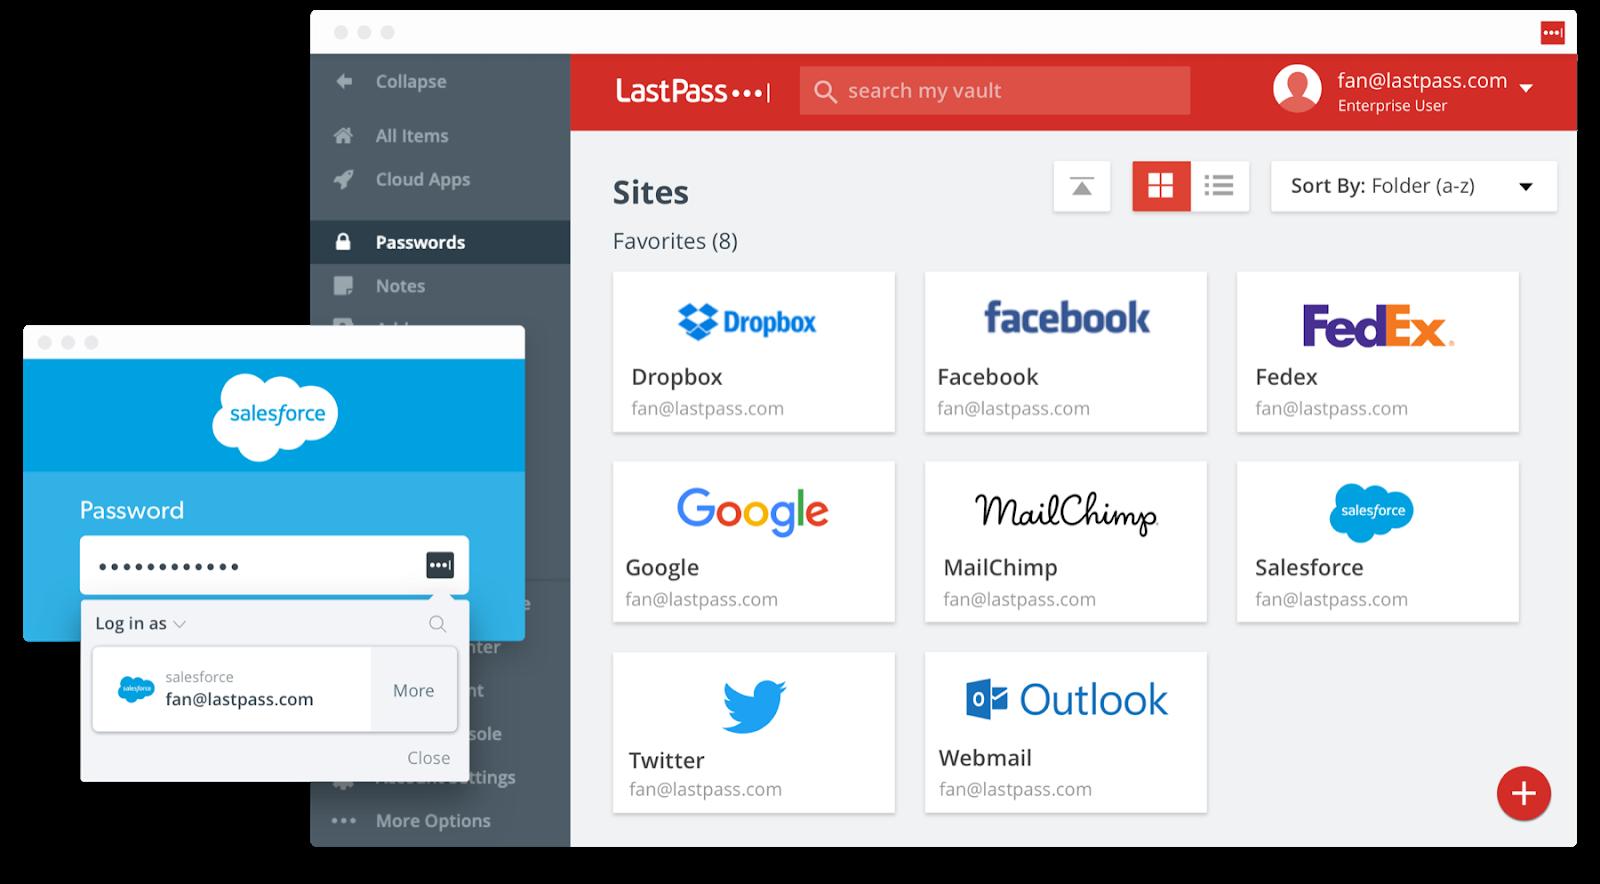 Screenshot of the LastPass productivity app.